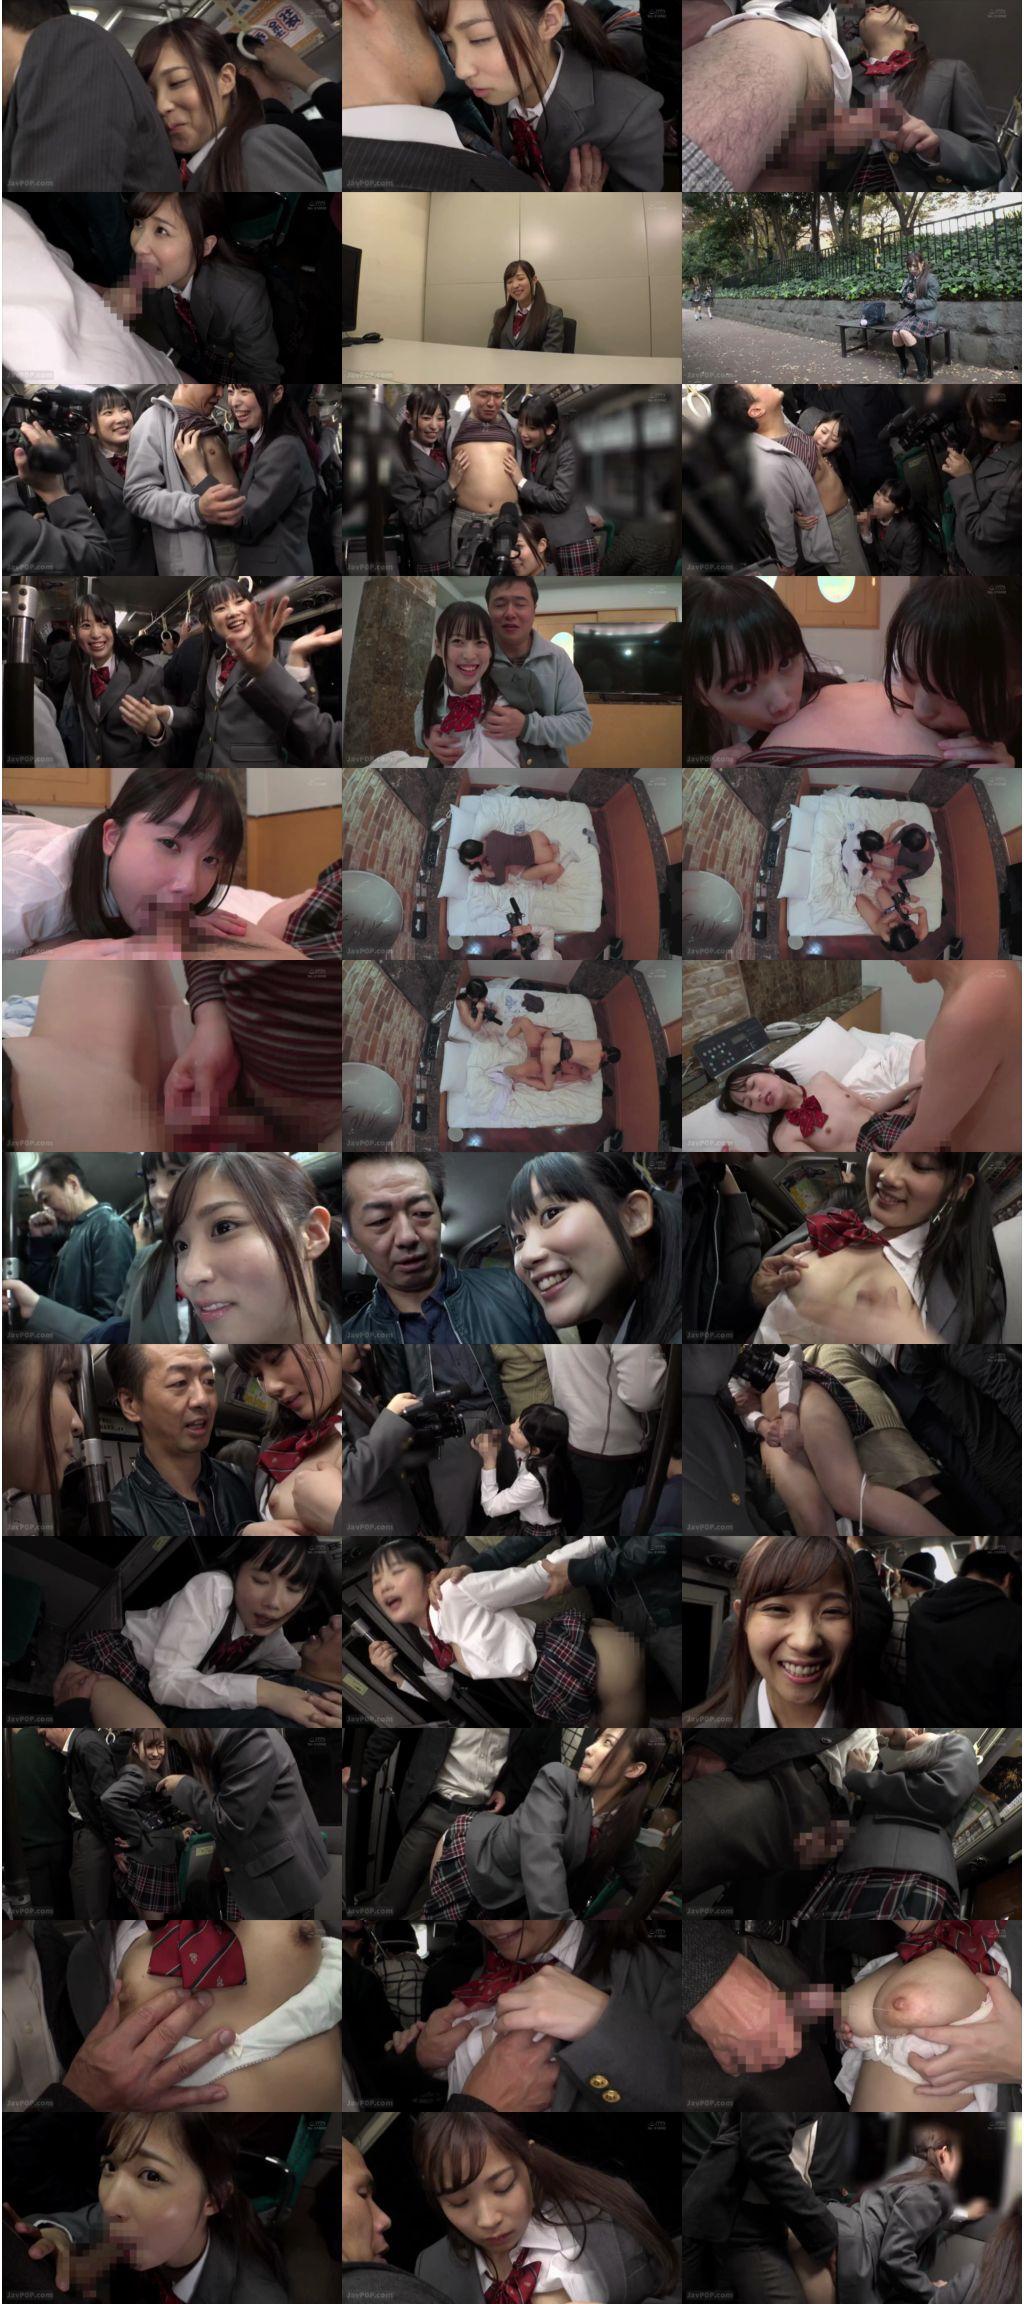 [DANDY-648] 「おじさん好きな女子○生たちにカメラを渡して逆痴漢してもらったら生々しいSEX映像が撮れました」VOL.1 学生服 Amemiya Rin Dandy フェラ 3P